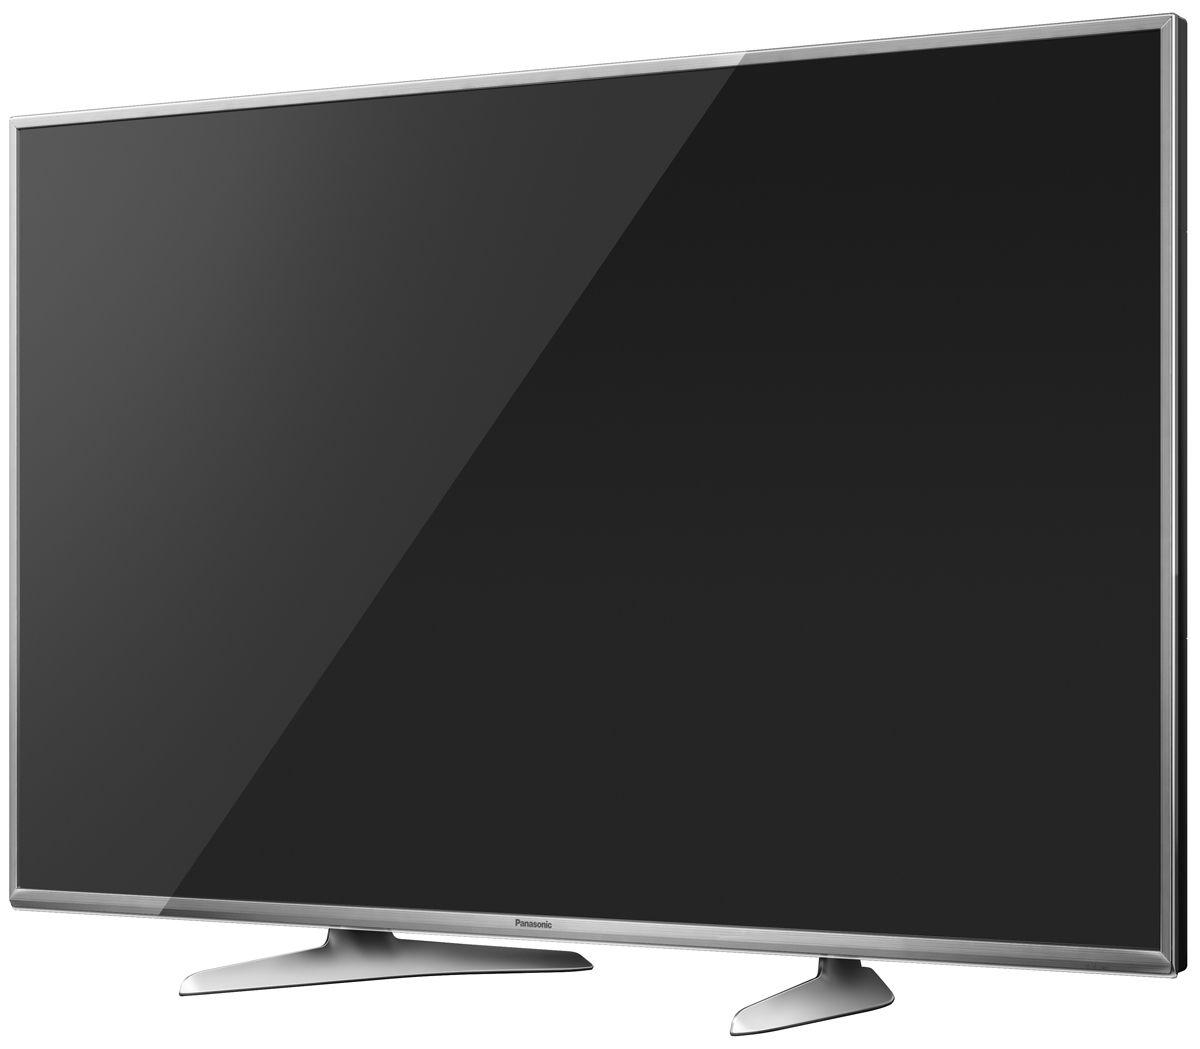 panasonic 55 4k ultra hd led smart tv th 55dx600u ebay. Black Bedroom Furniture Sets. Home Design Ideas